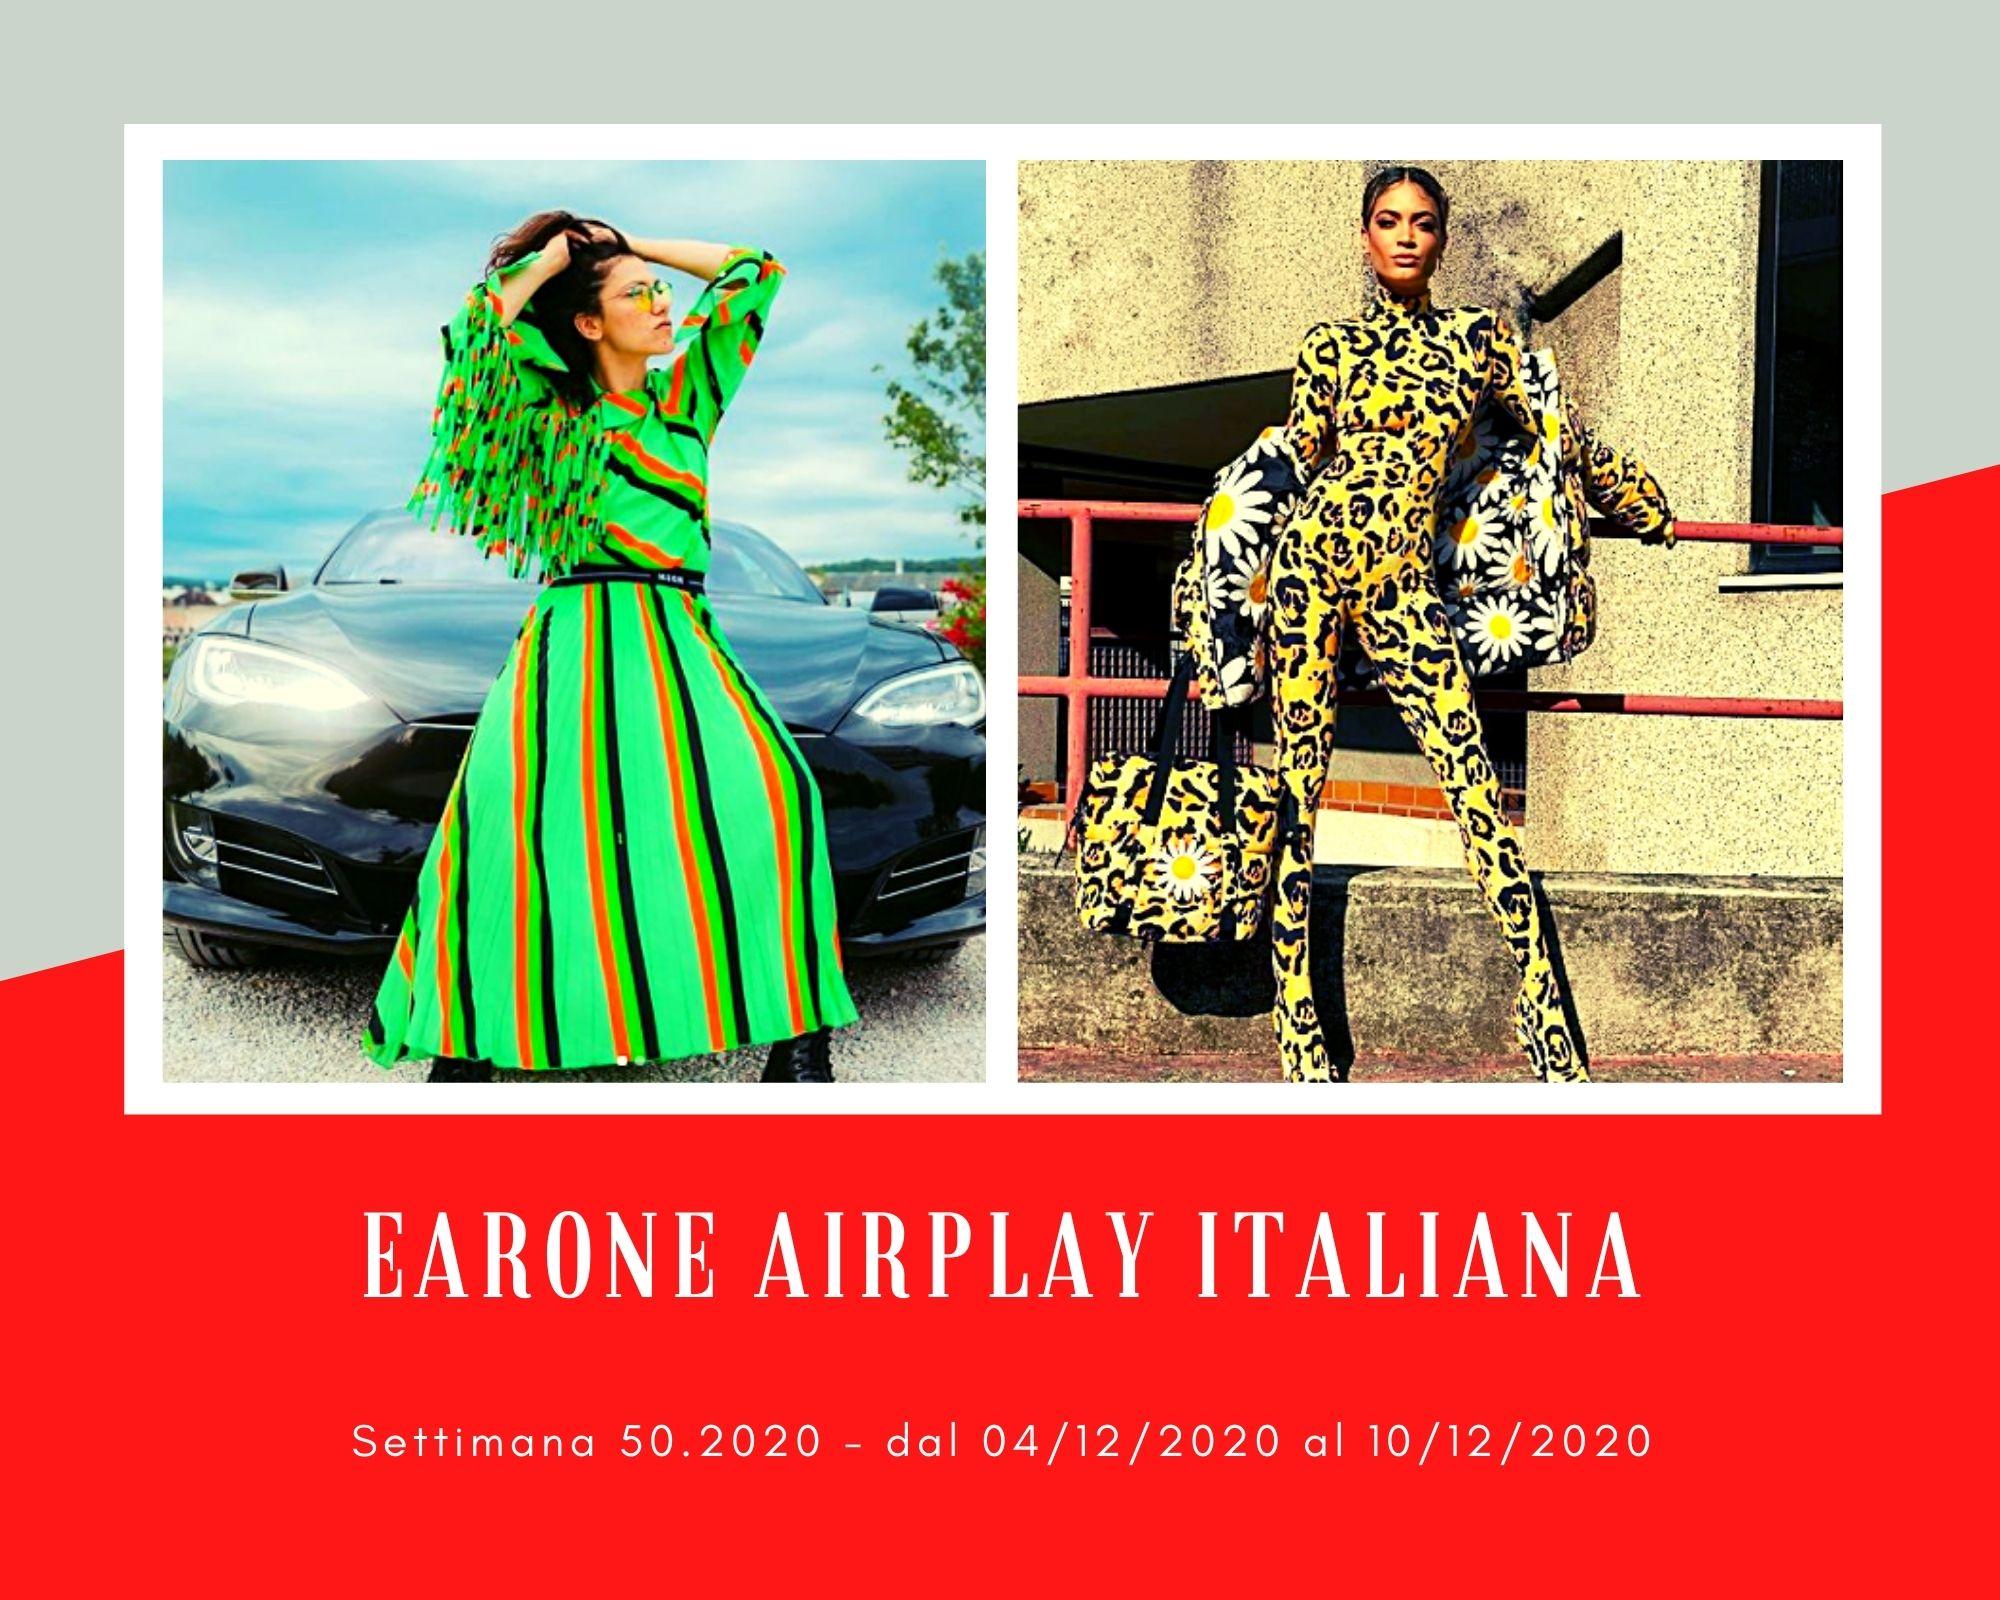 Classifica Radio EARONE Airplay Italiana, week 50. Dominano Elisa ed Elodie, ma in versione duetto